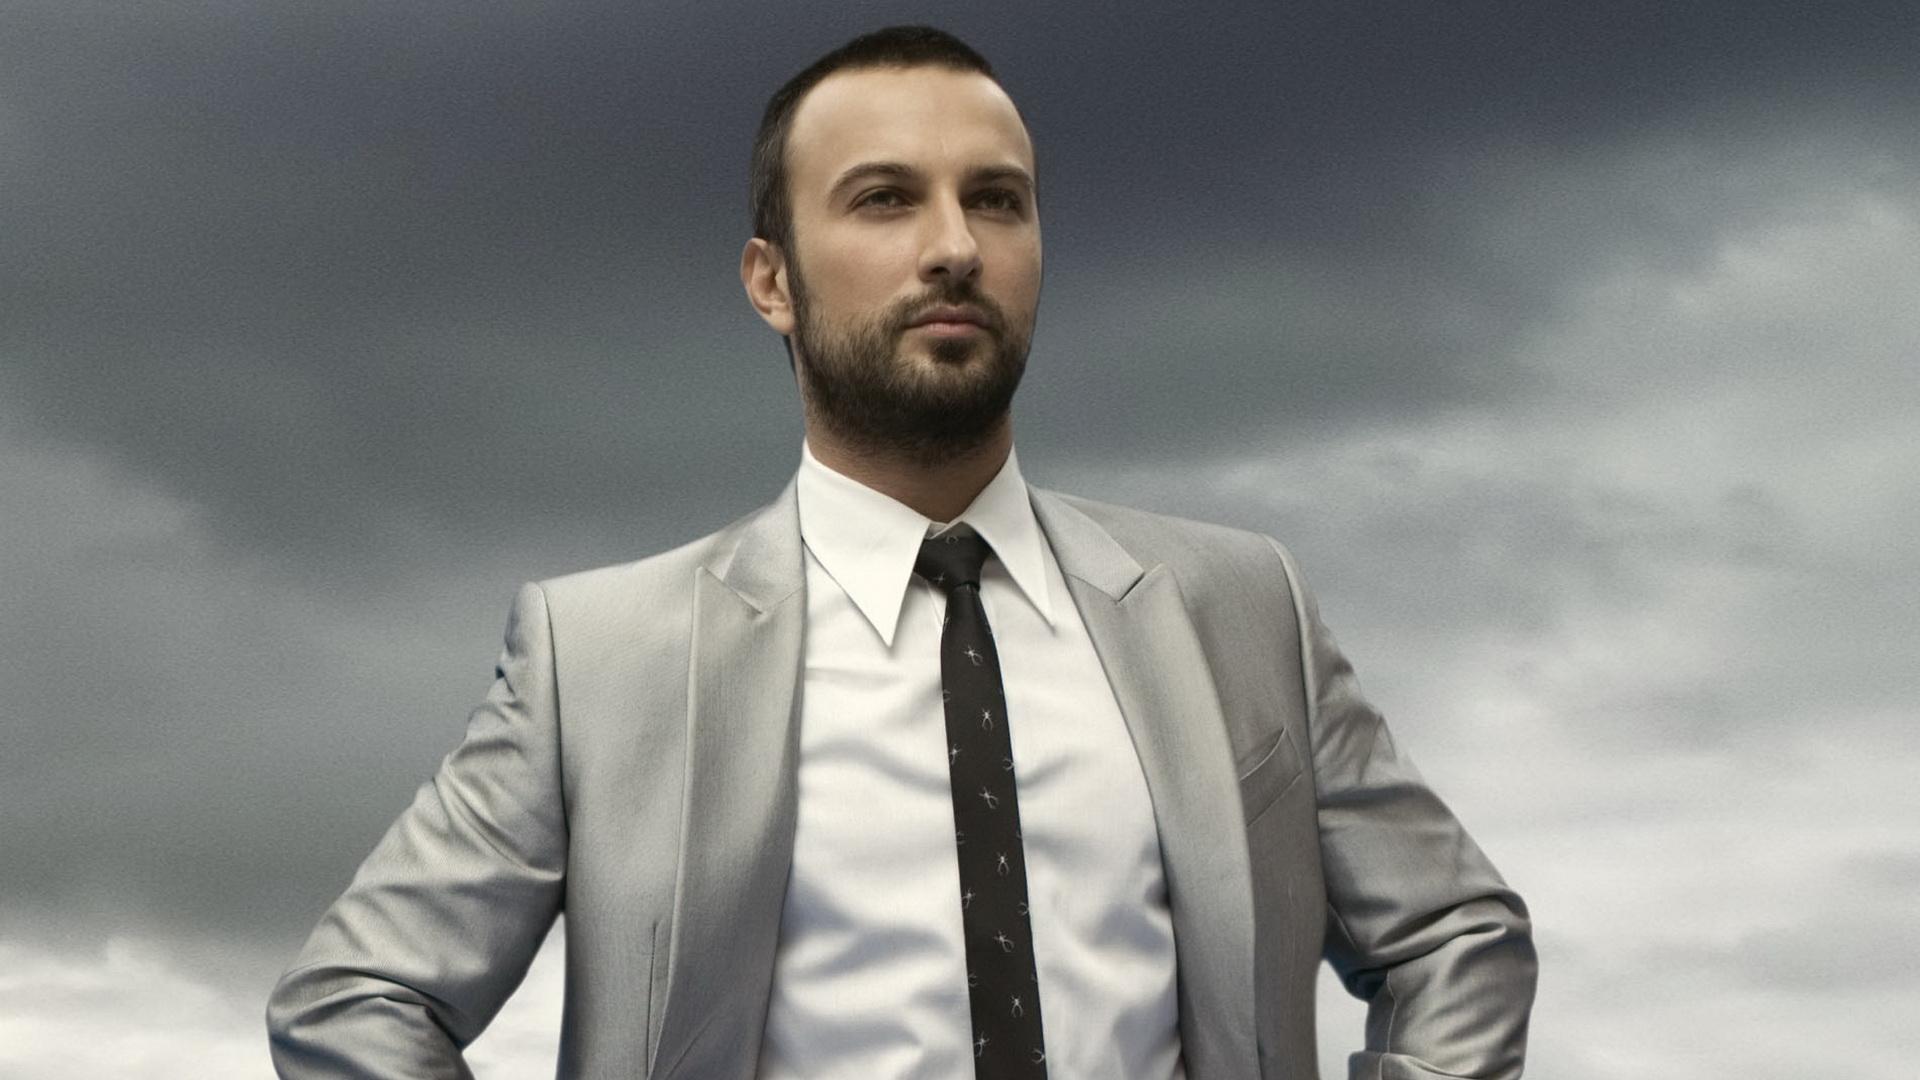 Tarkan (singer)